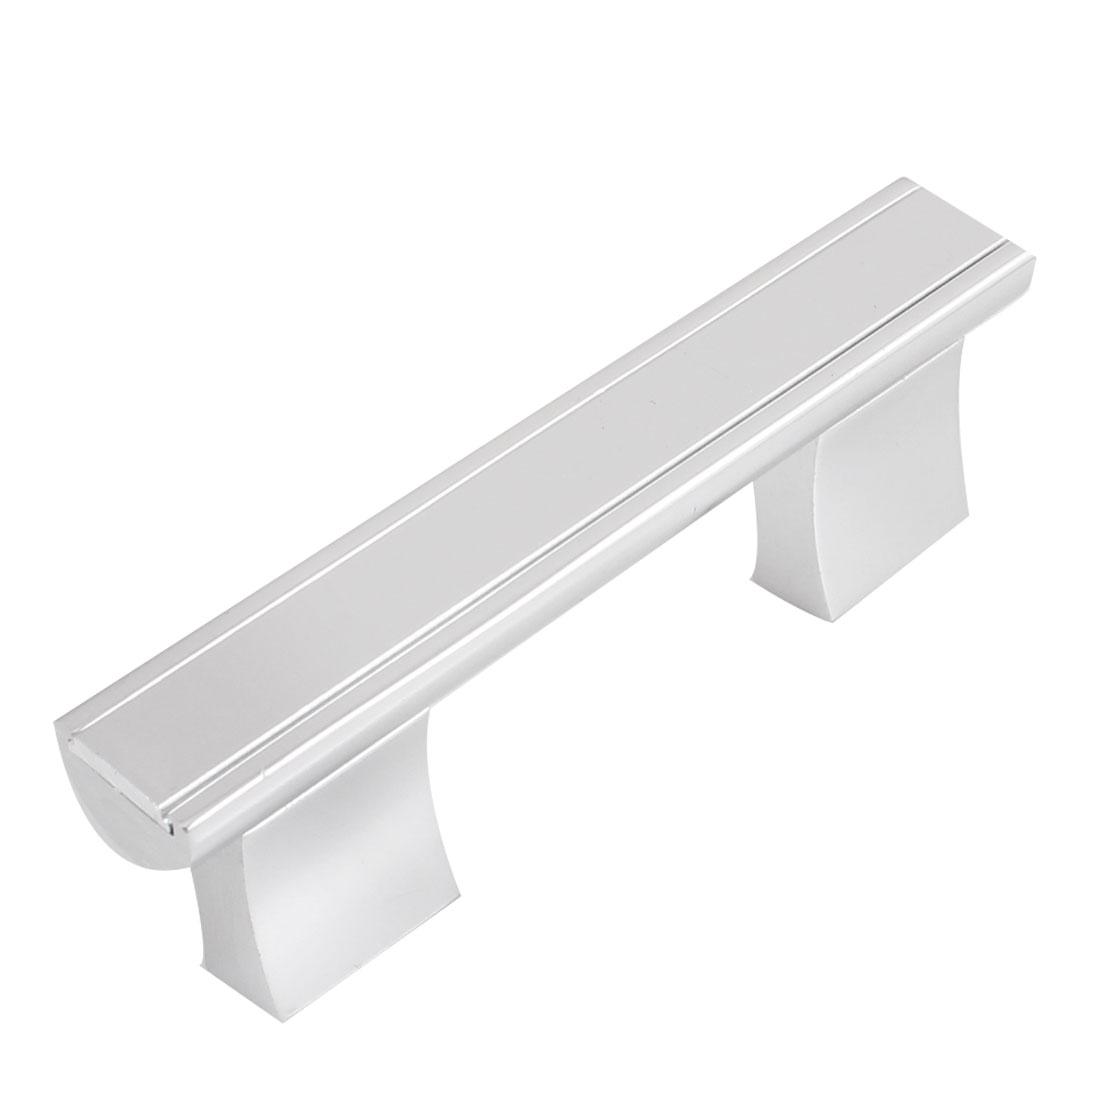 "Dresser Drawer Cabinet Part 3.8"" Length Aluminum Pull Handle"